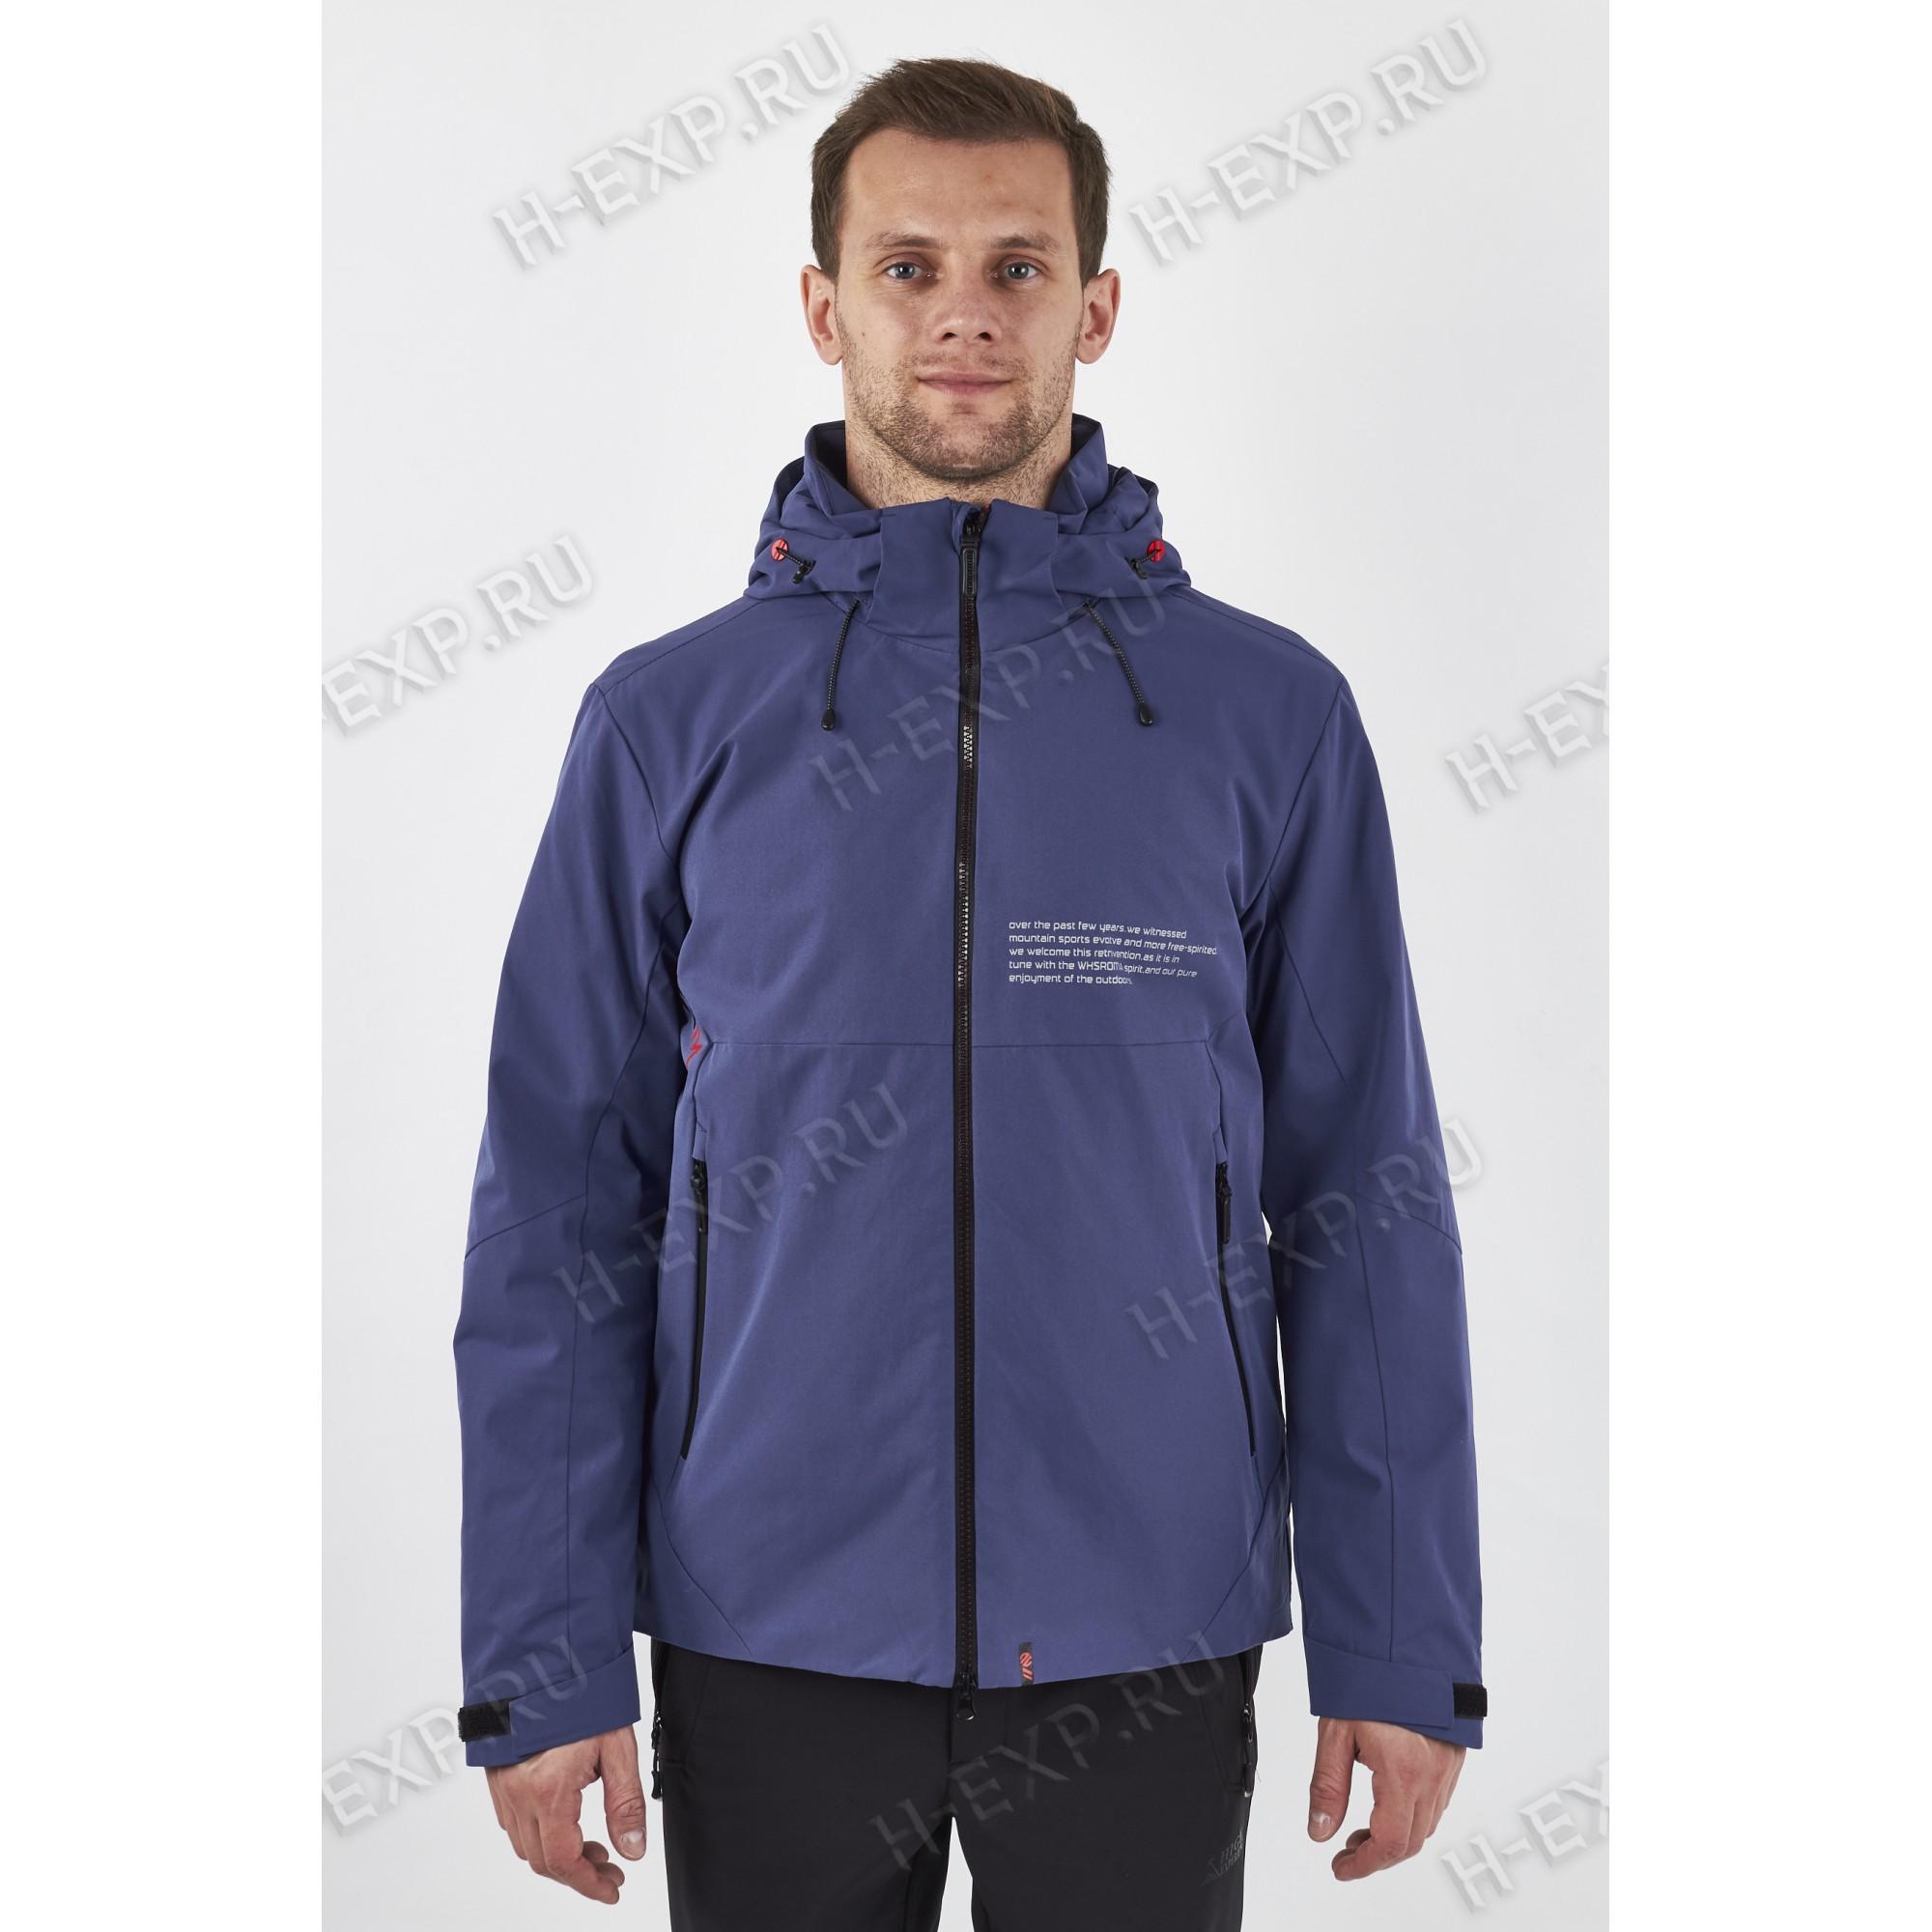 Куртка весна-осень мужская на тонком синтепоне WHS 611313 (L04) Джинс